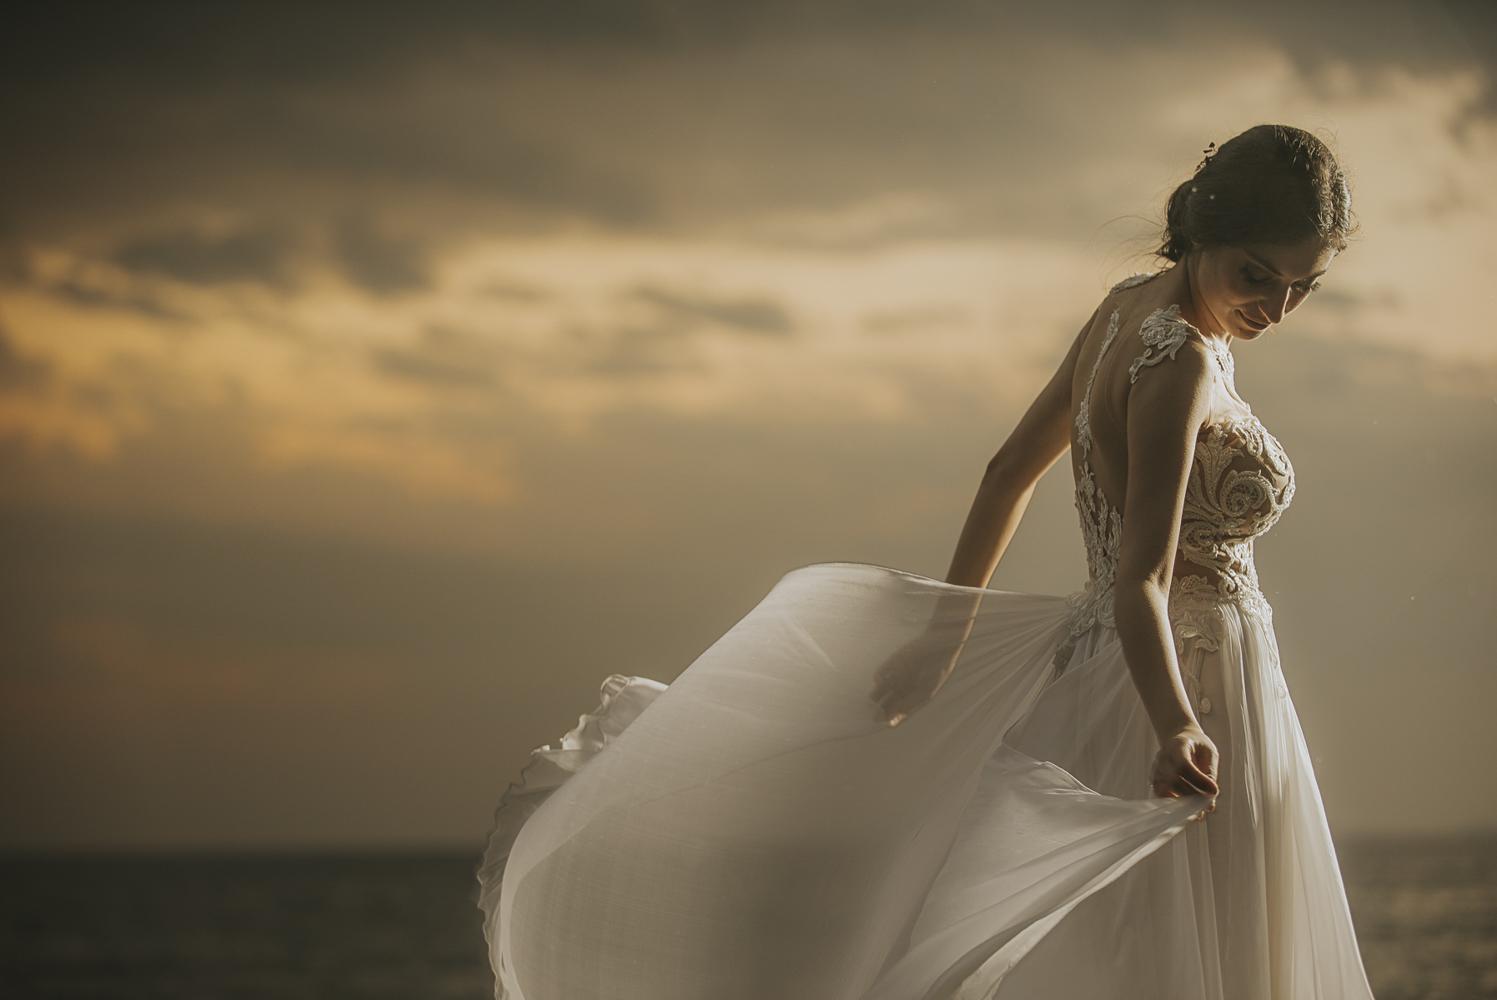 lulumeli φωτογραφια γαμου